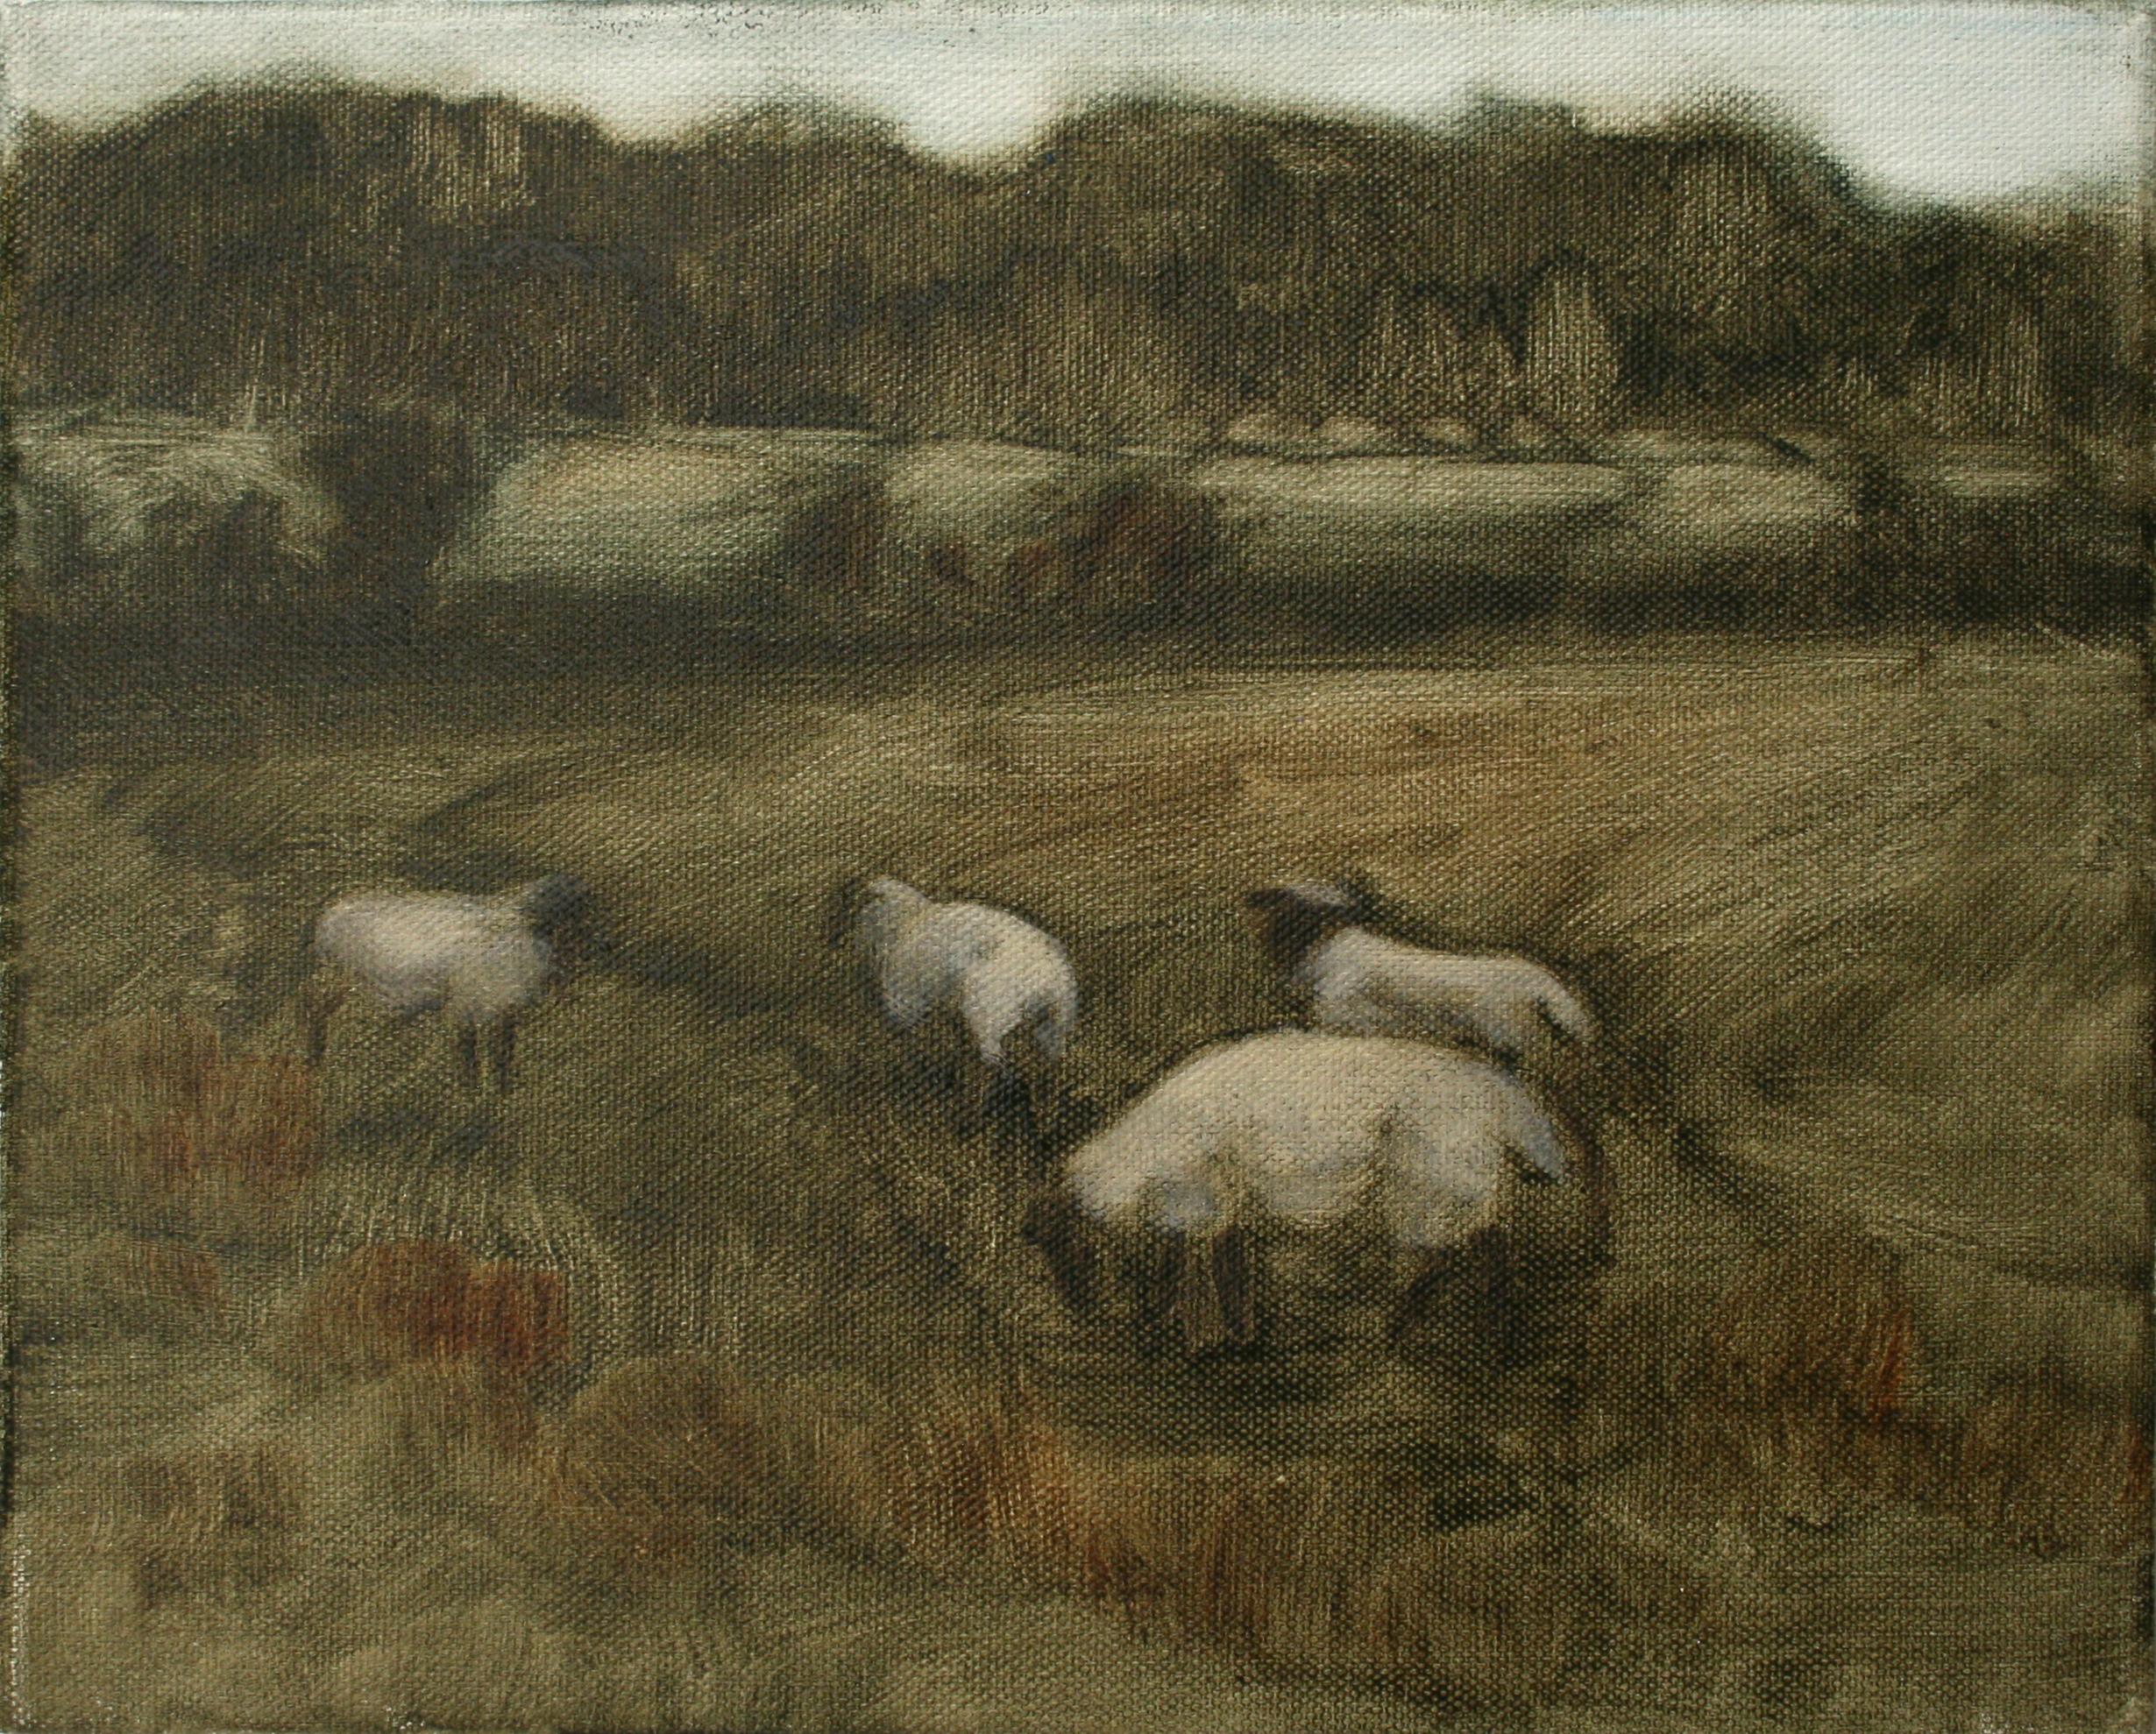 "Sheep Study 5, oil on canvas 30 x 24.5 cm (12"" x 9.5""), 2016"